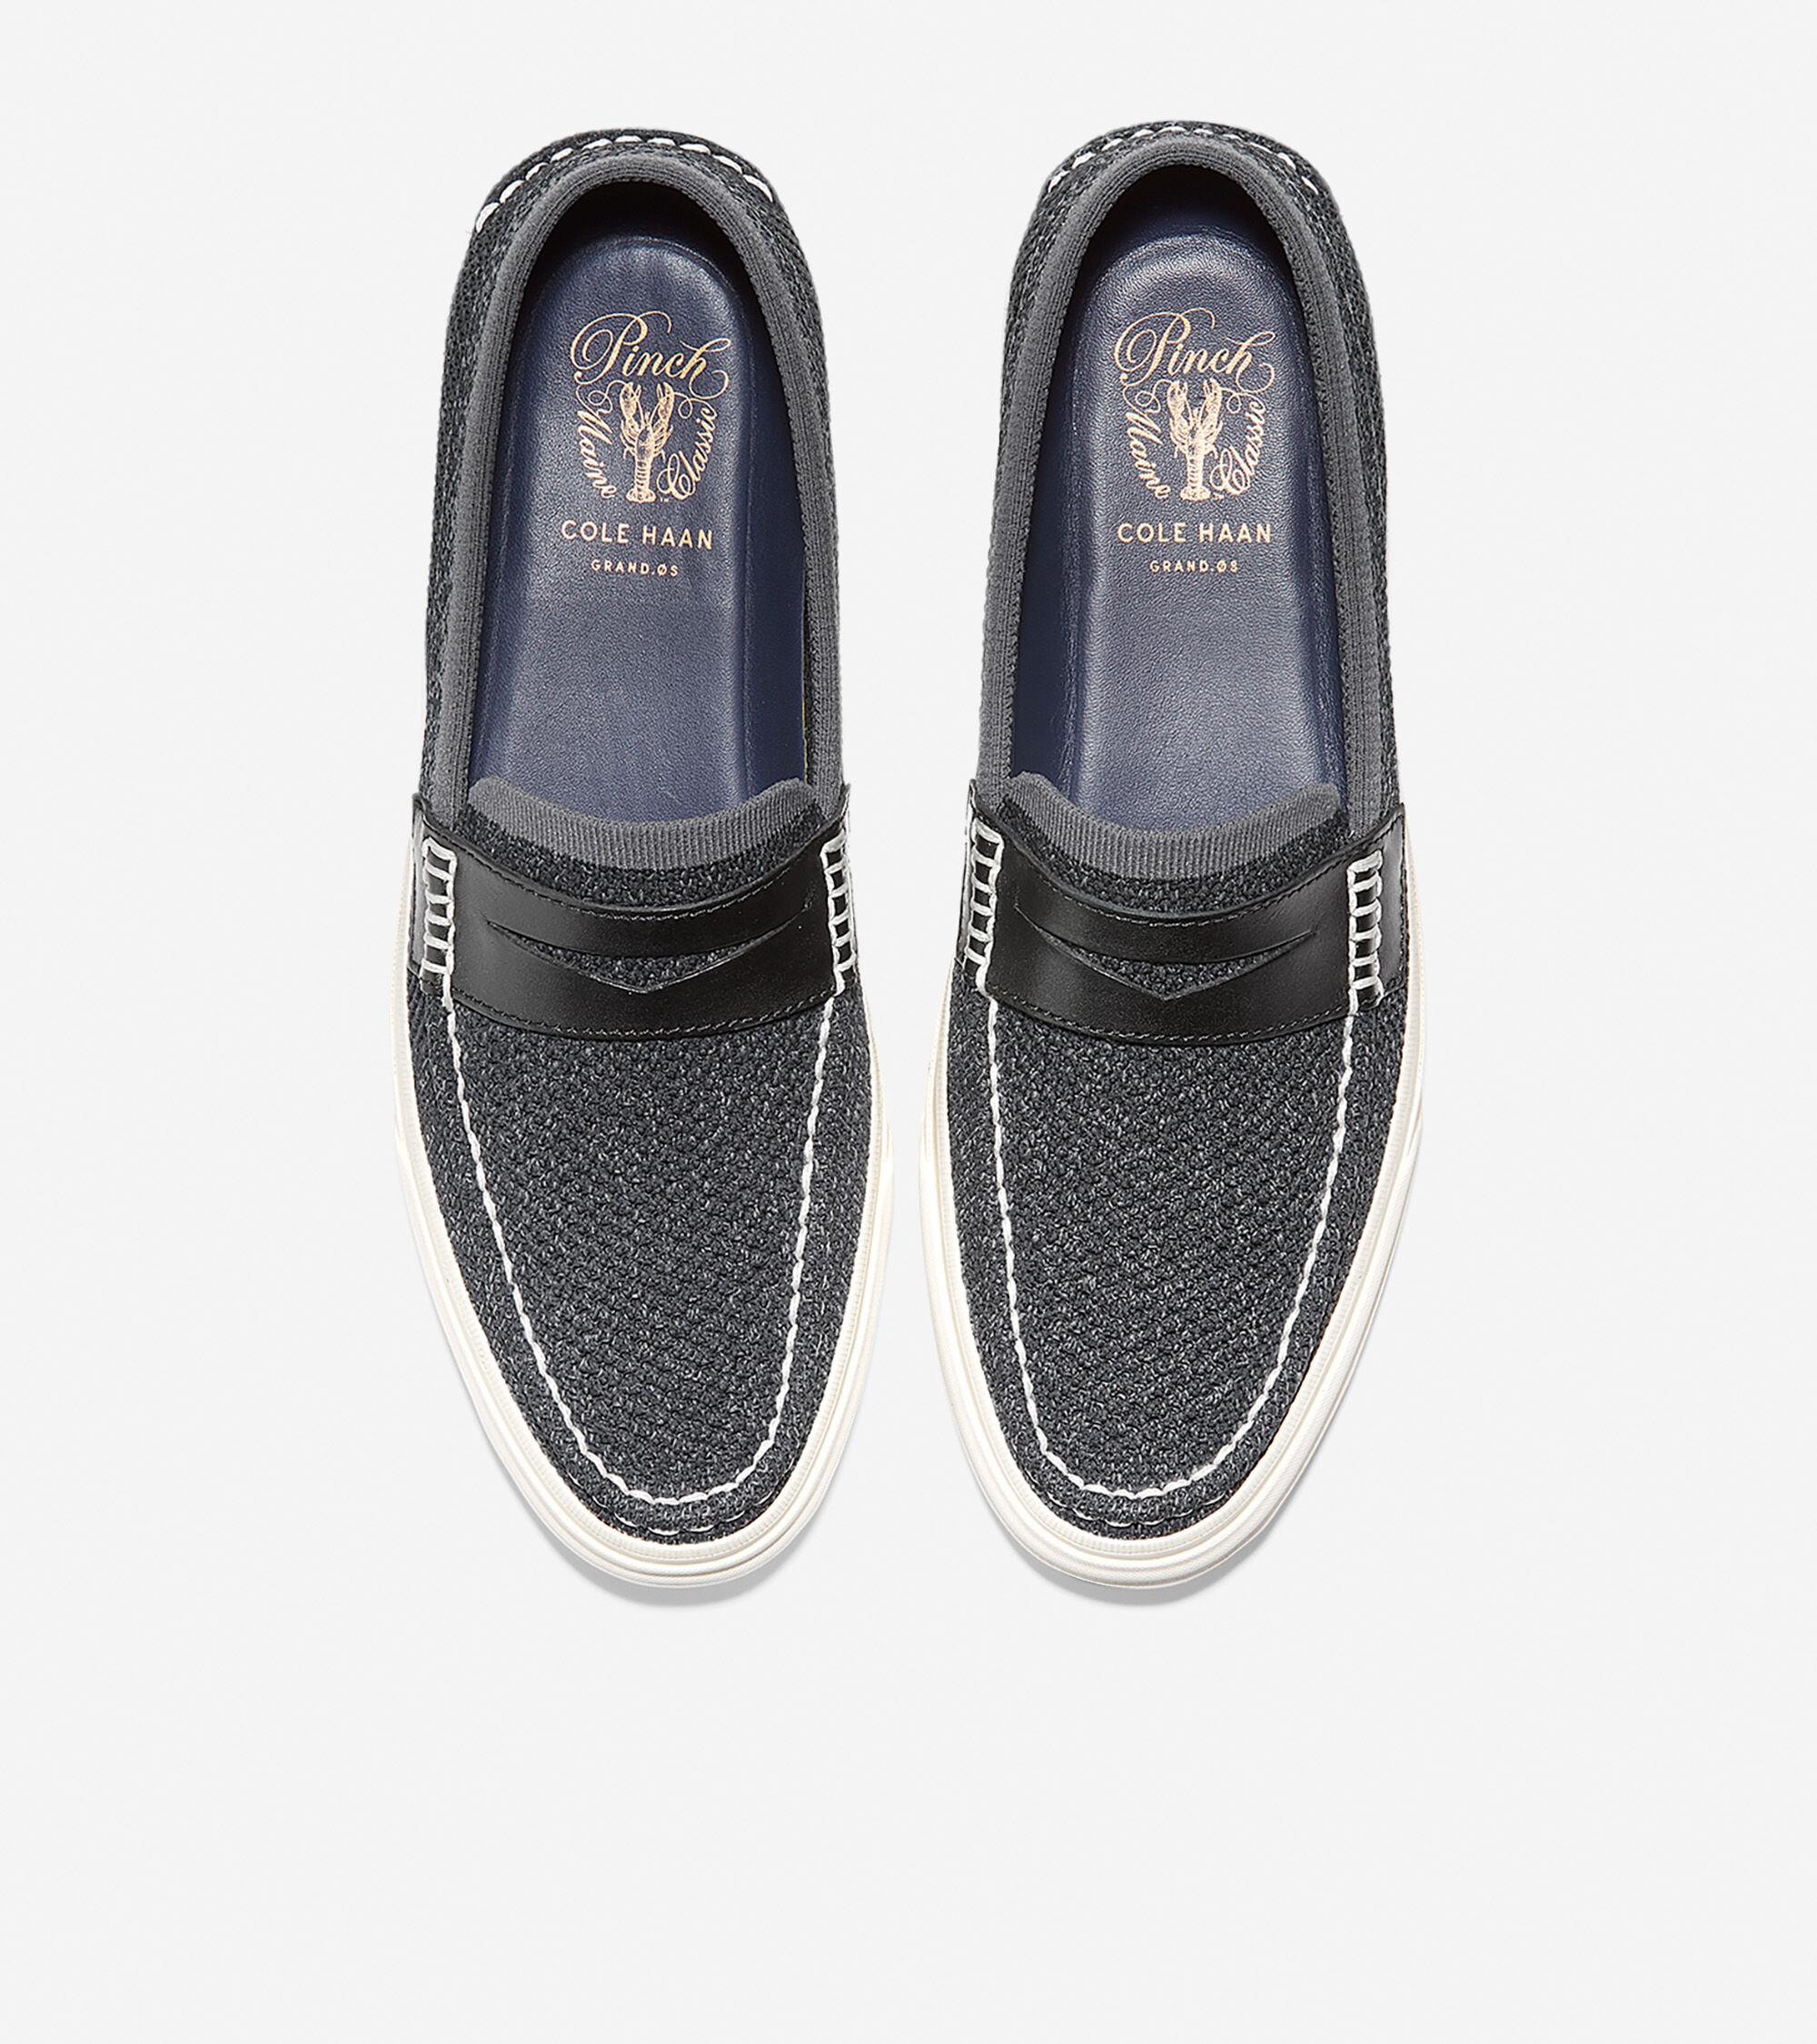 06fccca7cd1 Men s Pinch Weekender LX Loafers with Stitchlite in Black